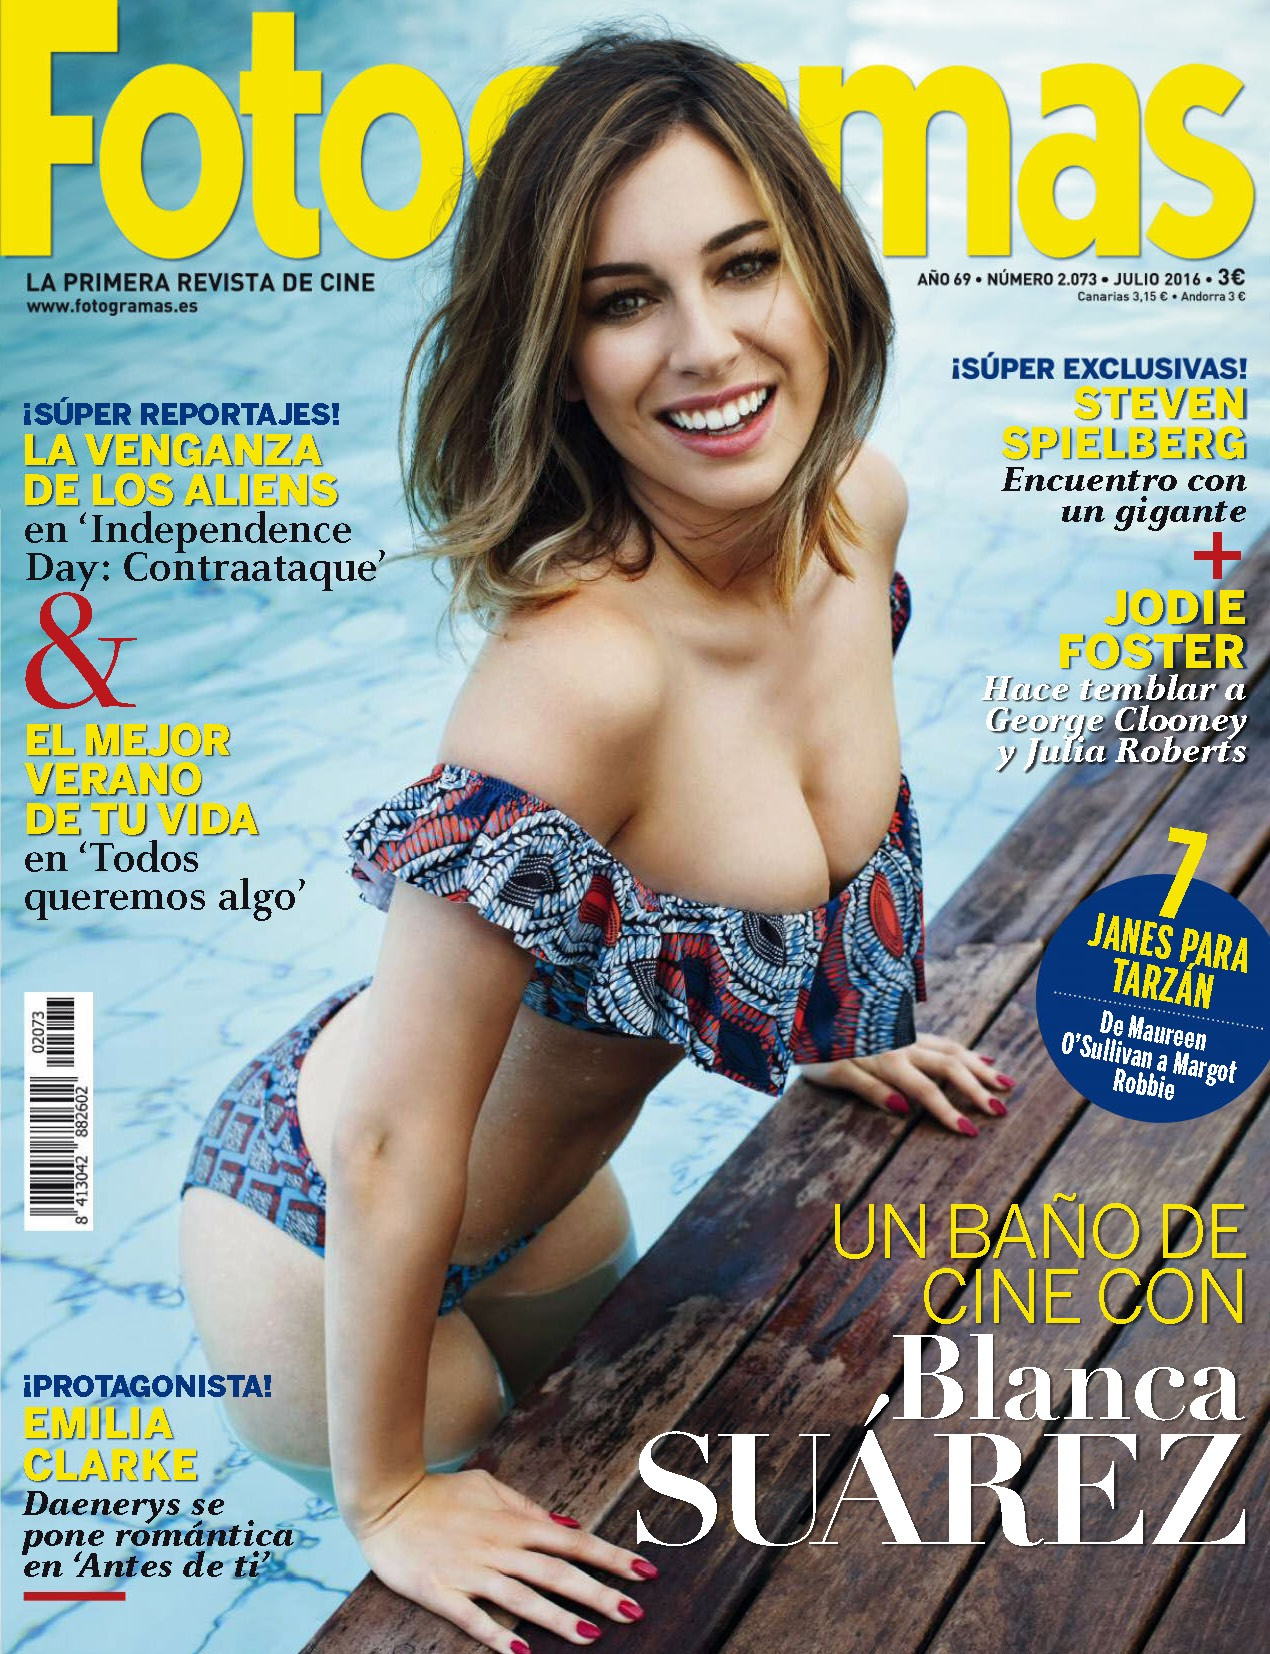 Blanca Suarez follando 2